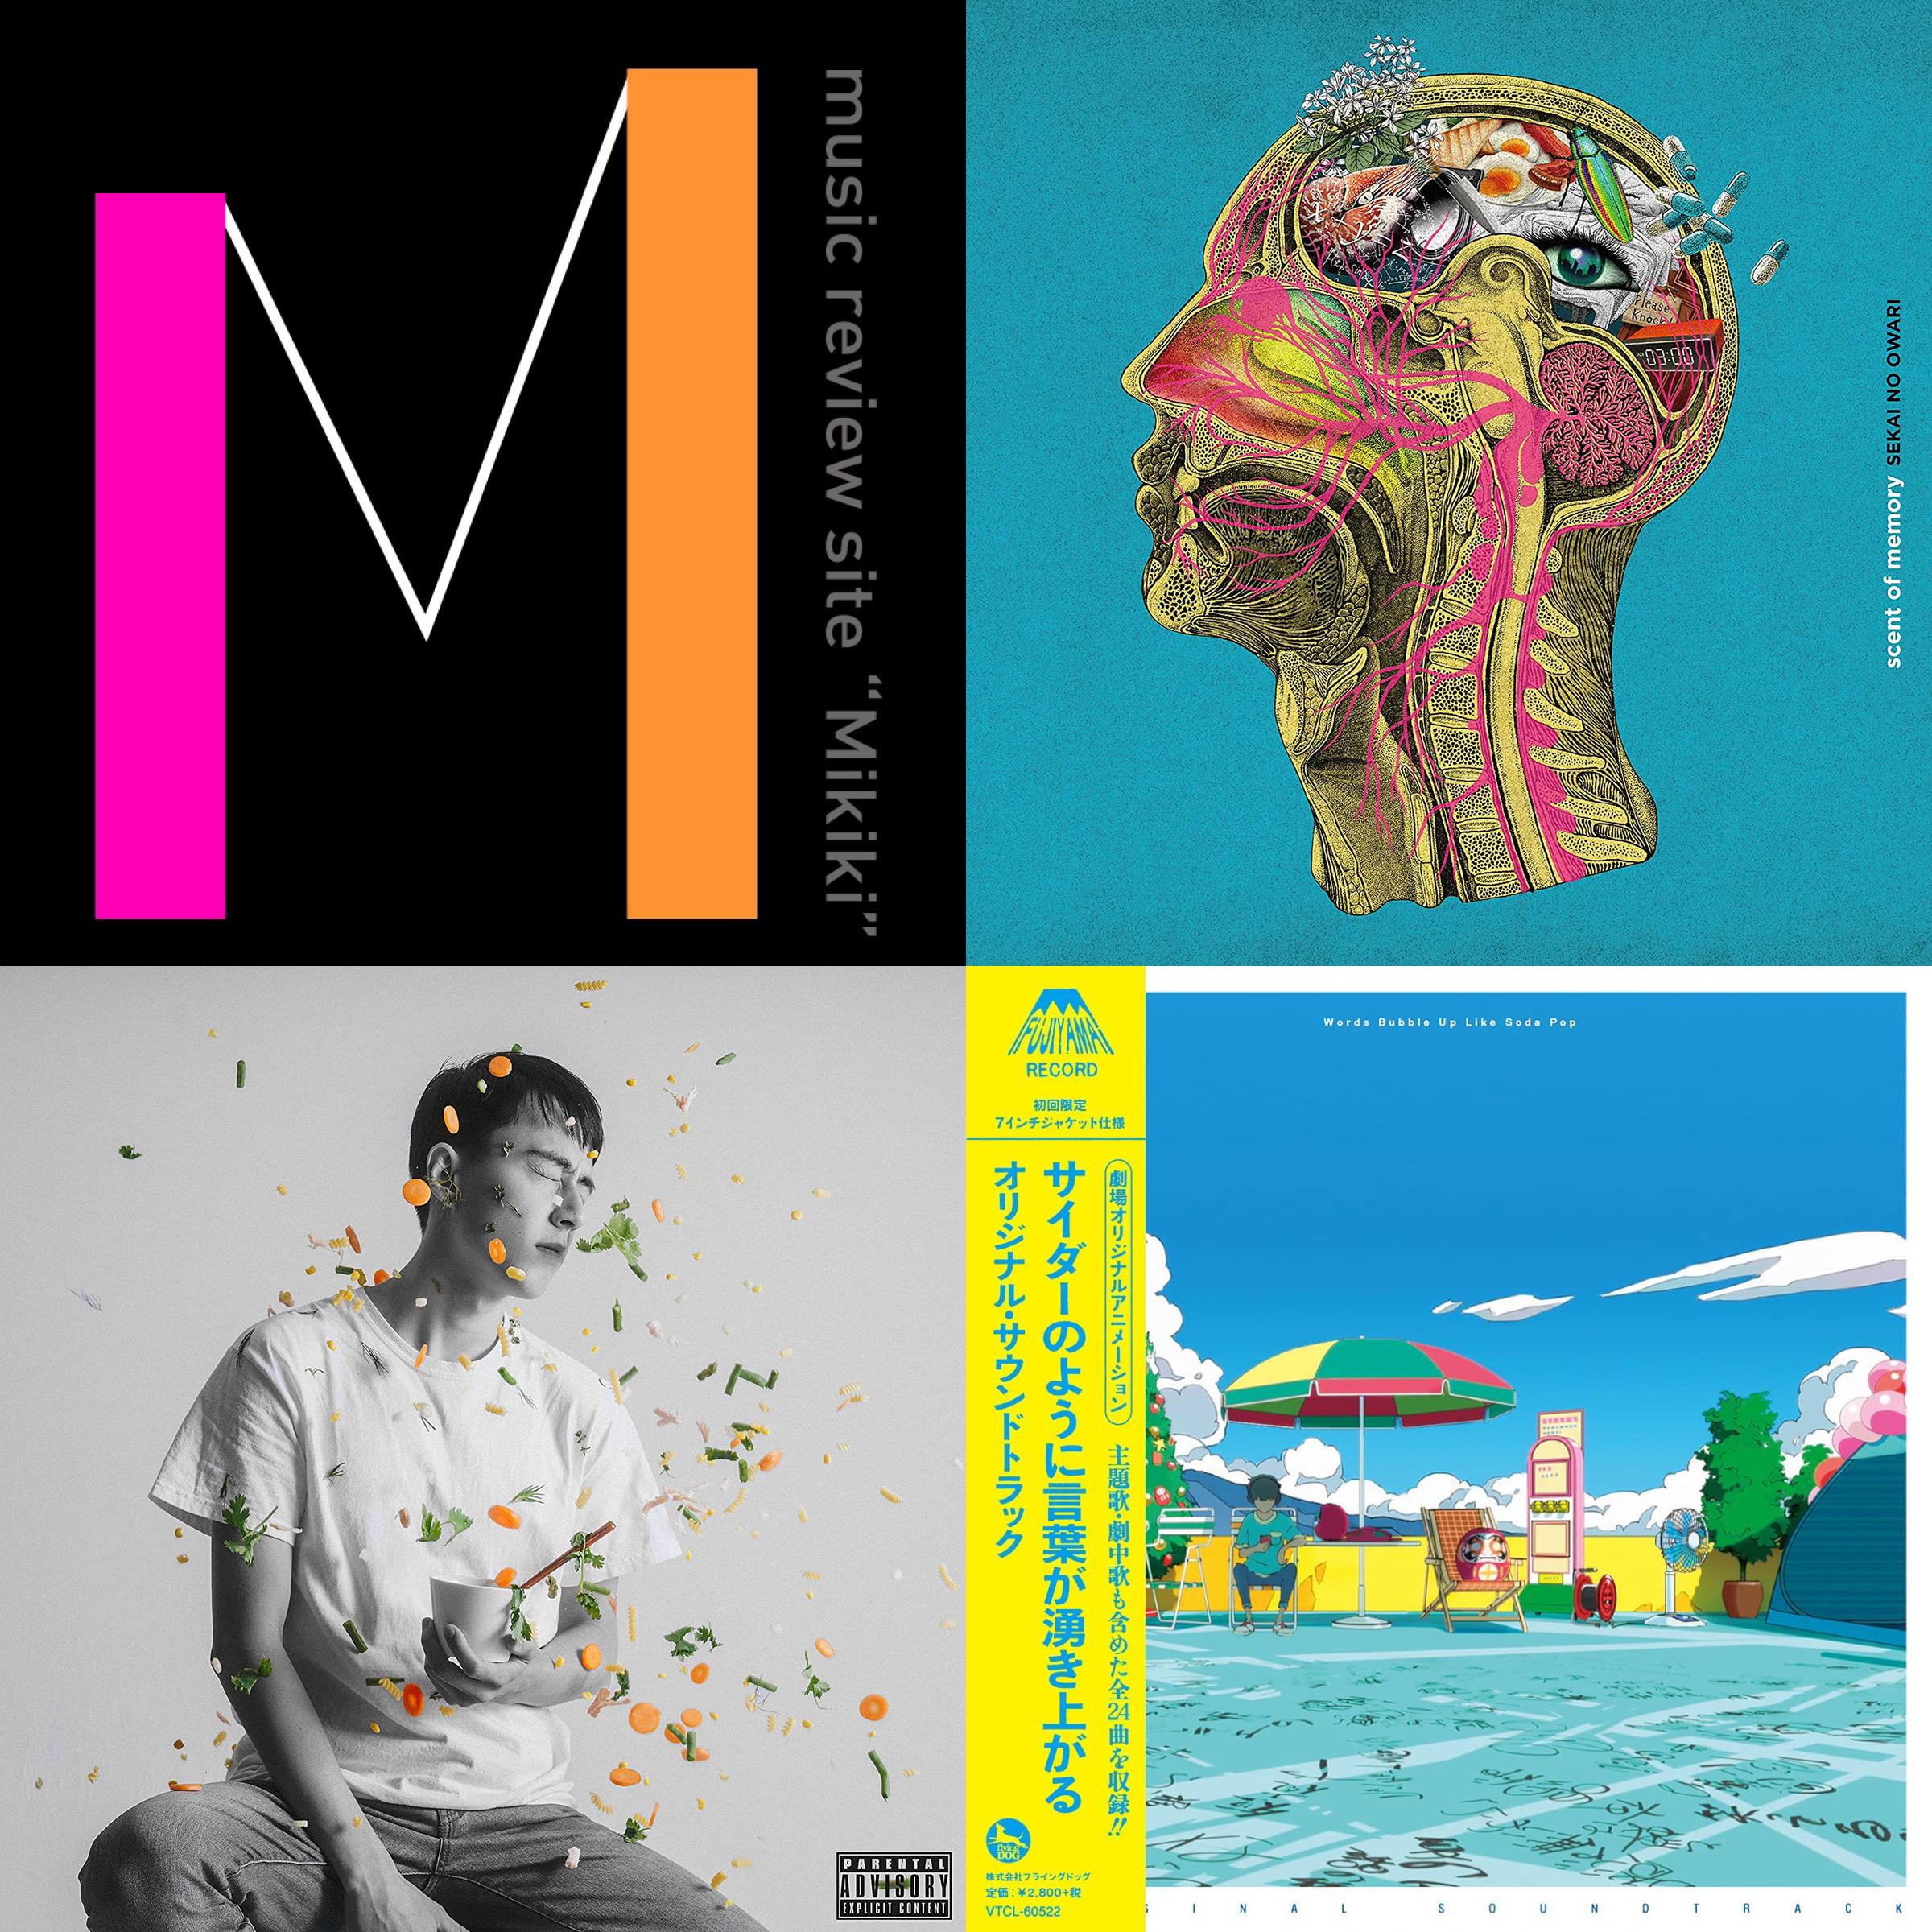 SEKAI NO OWARI、Wez Atlas、「サイダーのように言葉が湧き上がる」サントラなど今週リリースのMikiki推し邦楽アルバム/EP7選!